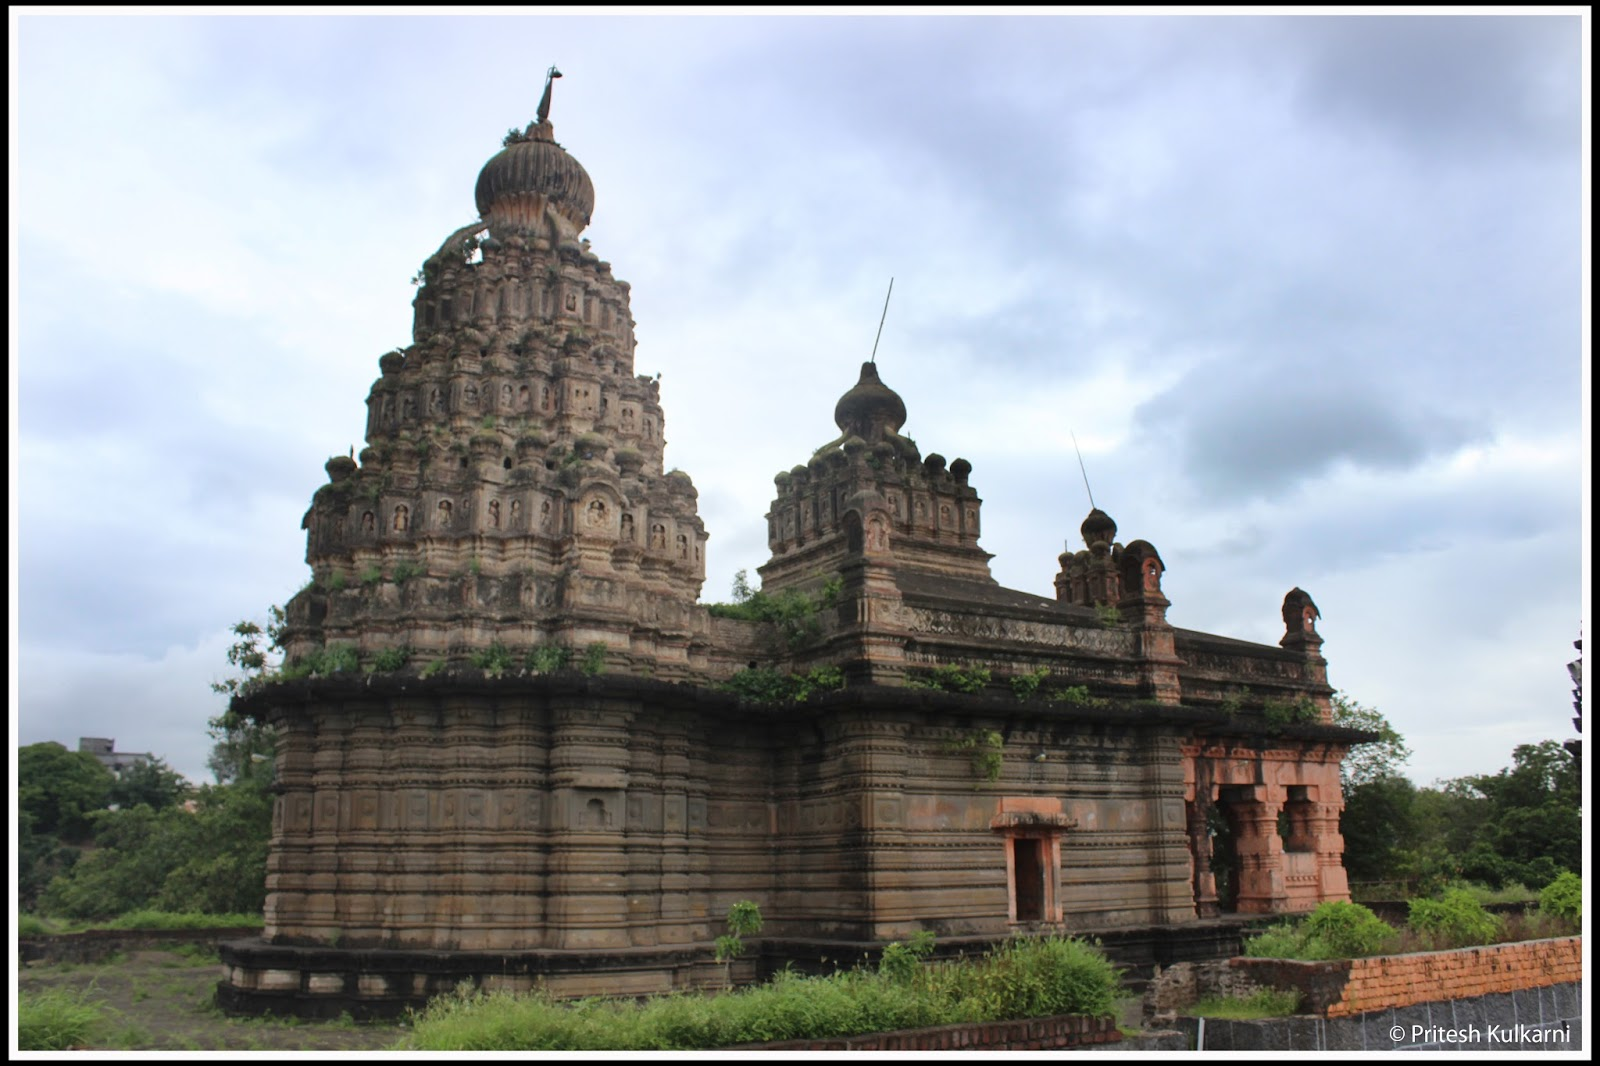 Sangameshwar Temple to Visit in Pune